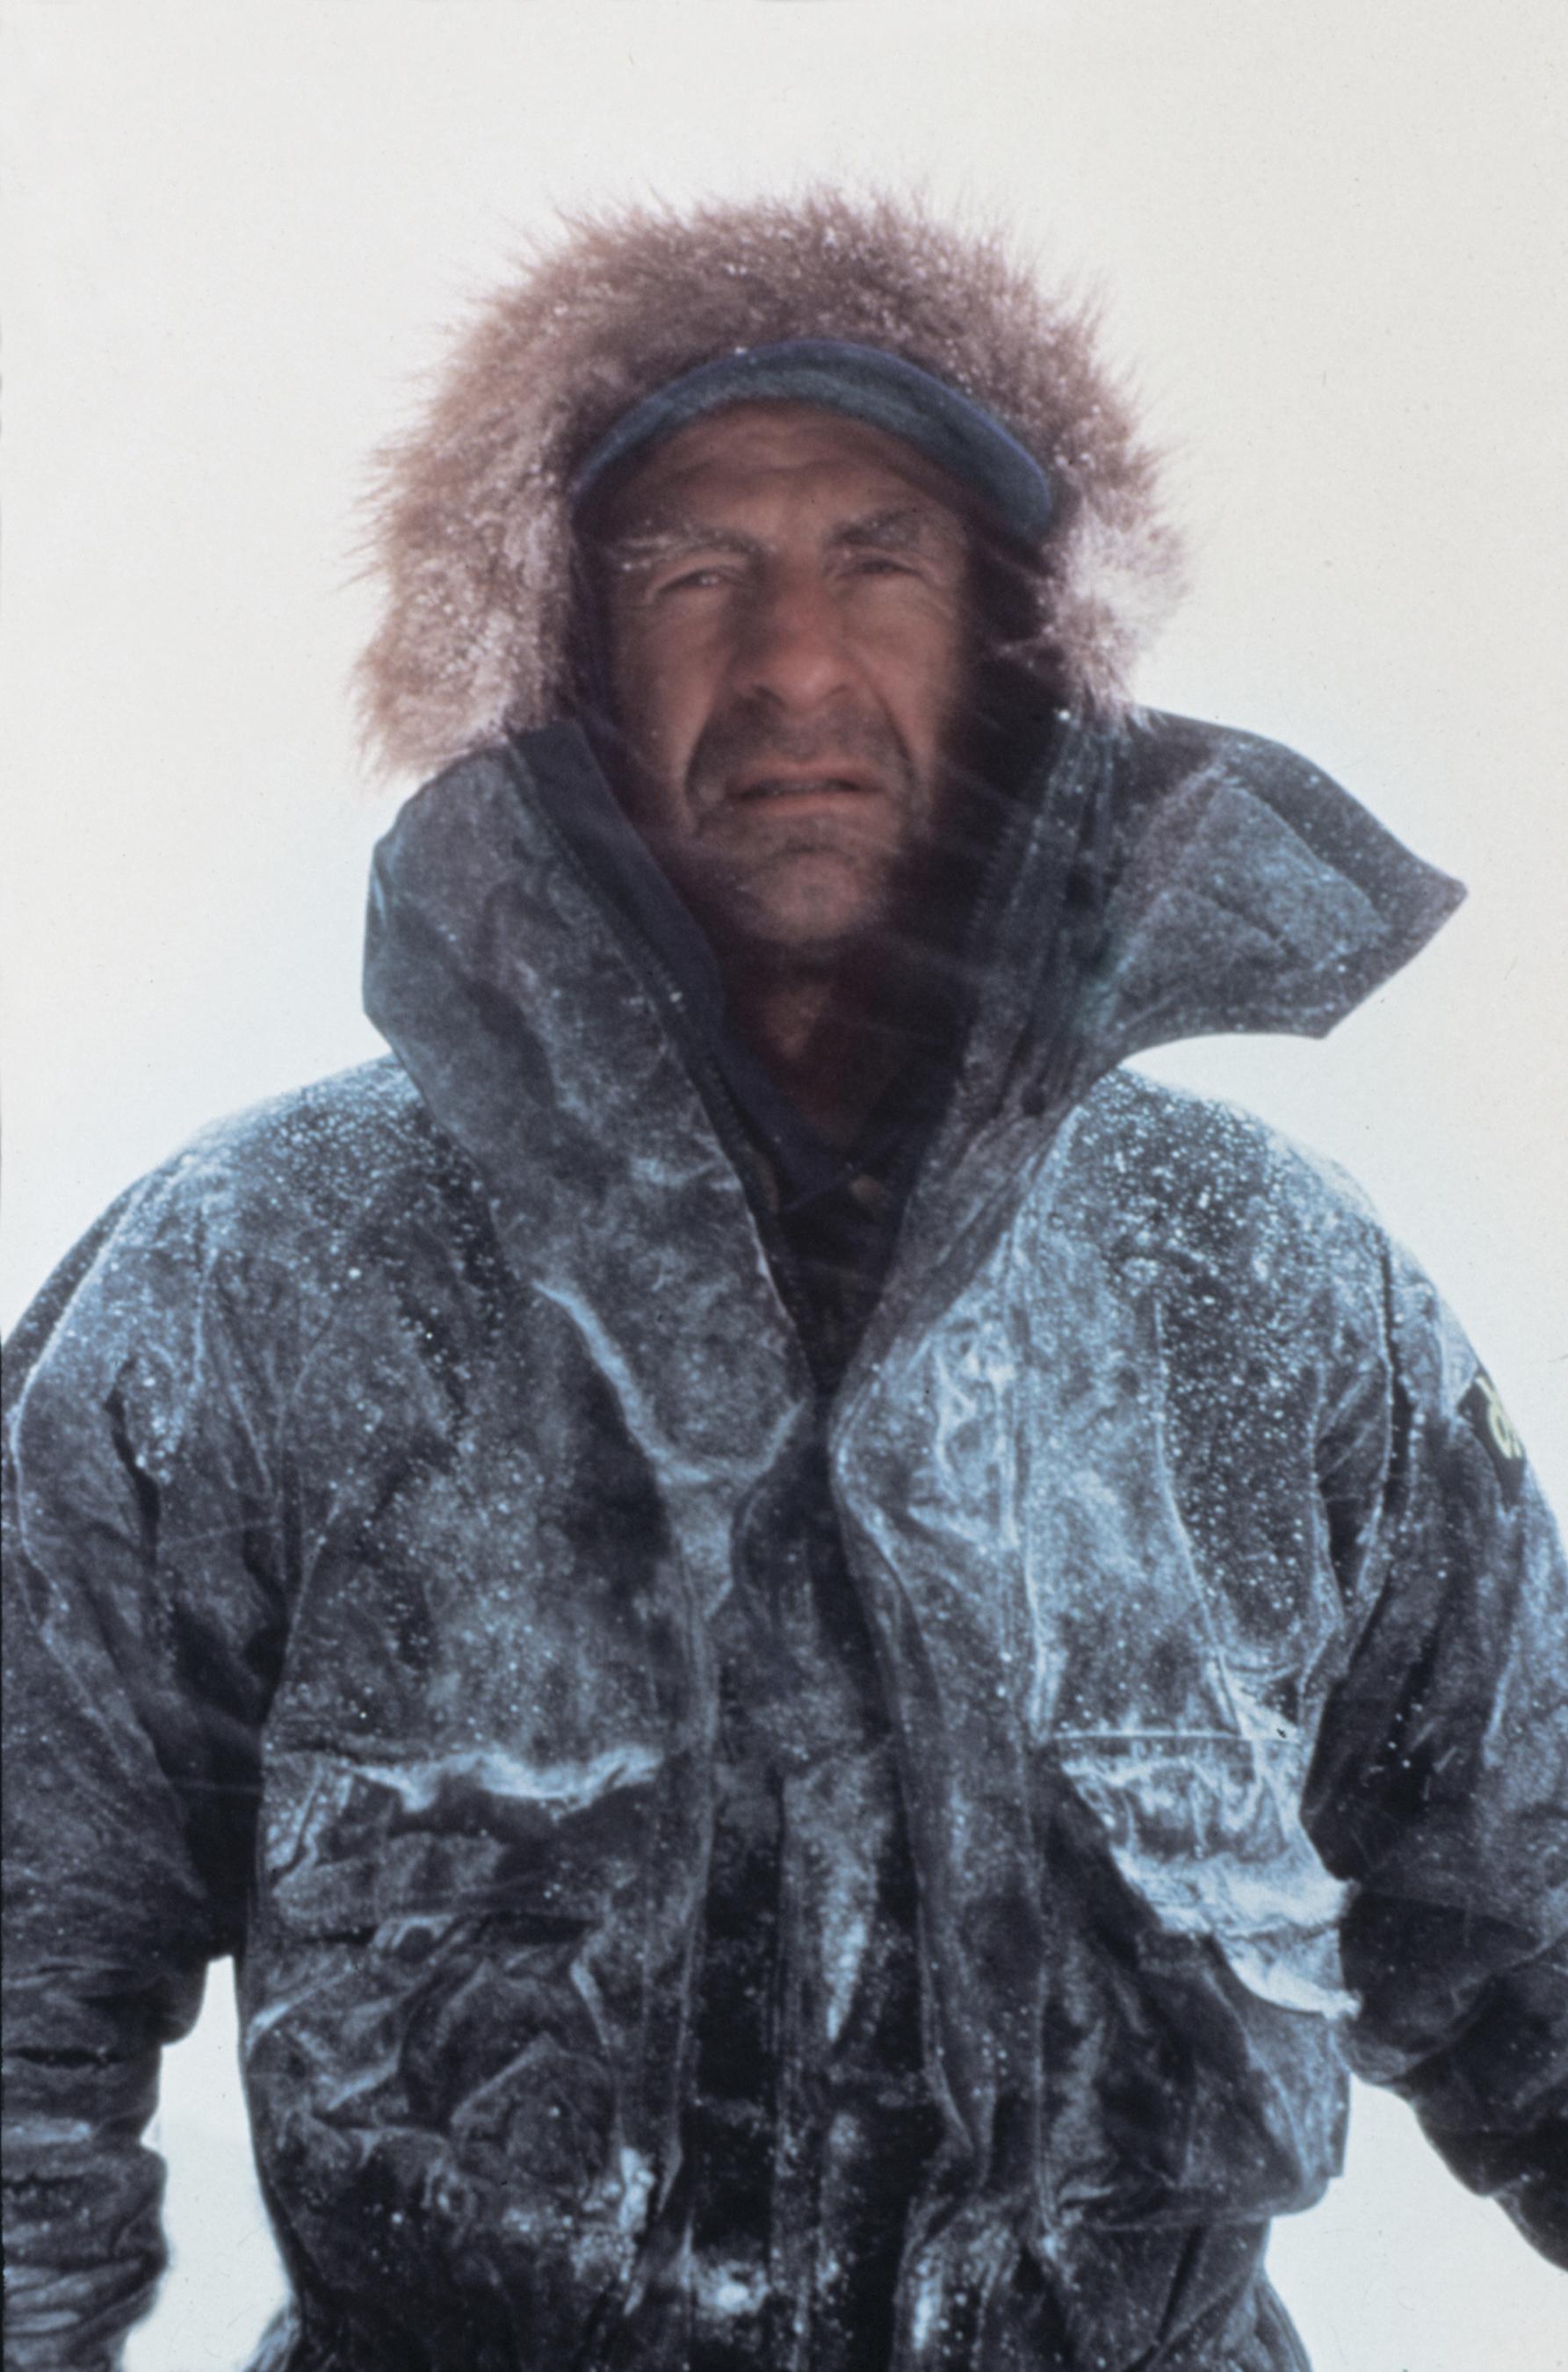 Sir Ranulph Fiennes headlines the Adventure Travel Show (PRNewsFoto/The Adventure Travel Show)